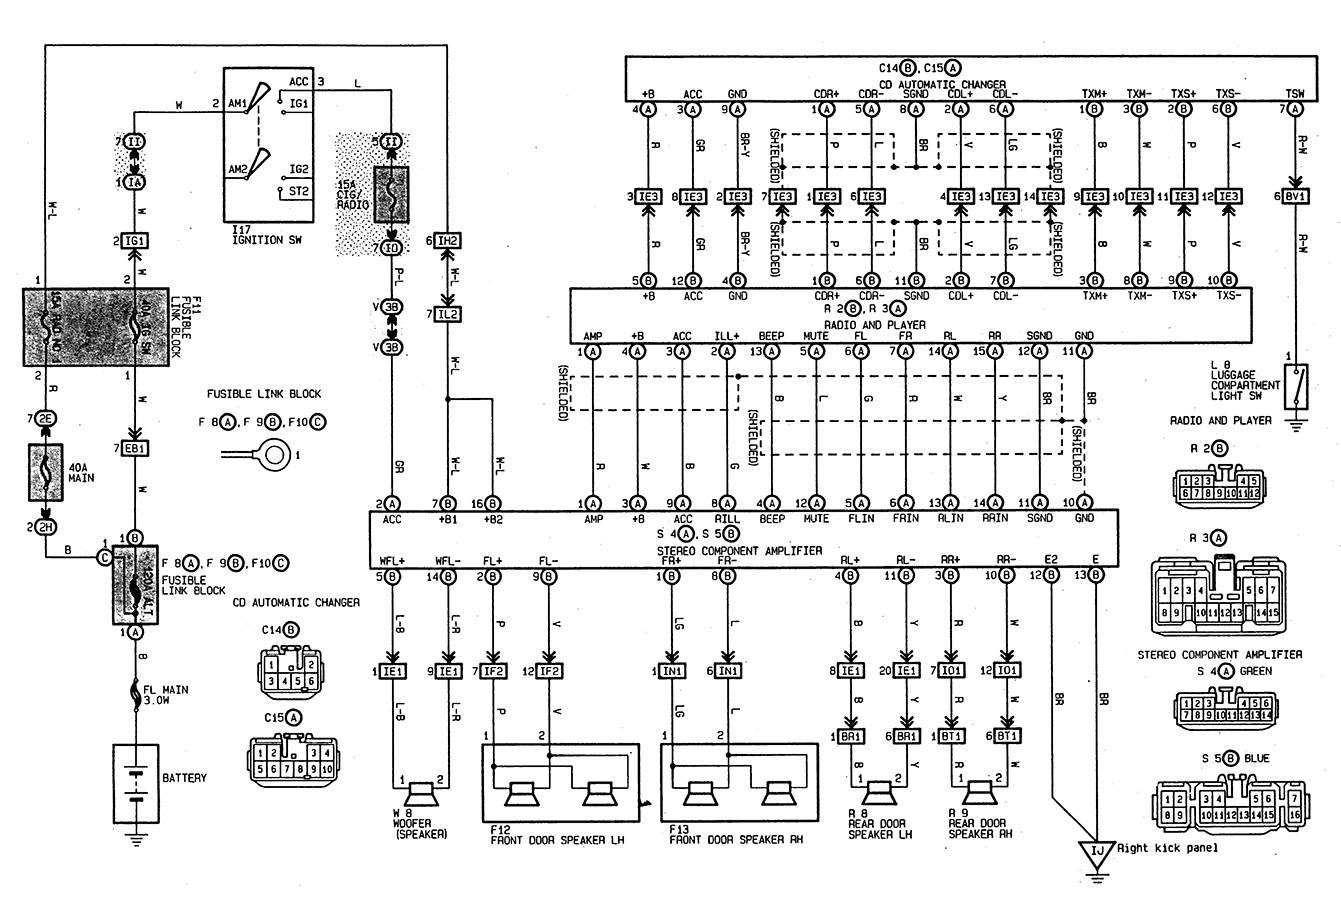 1997 4runner radio wiring diagram